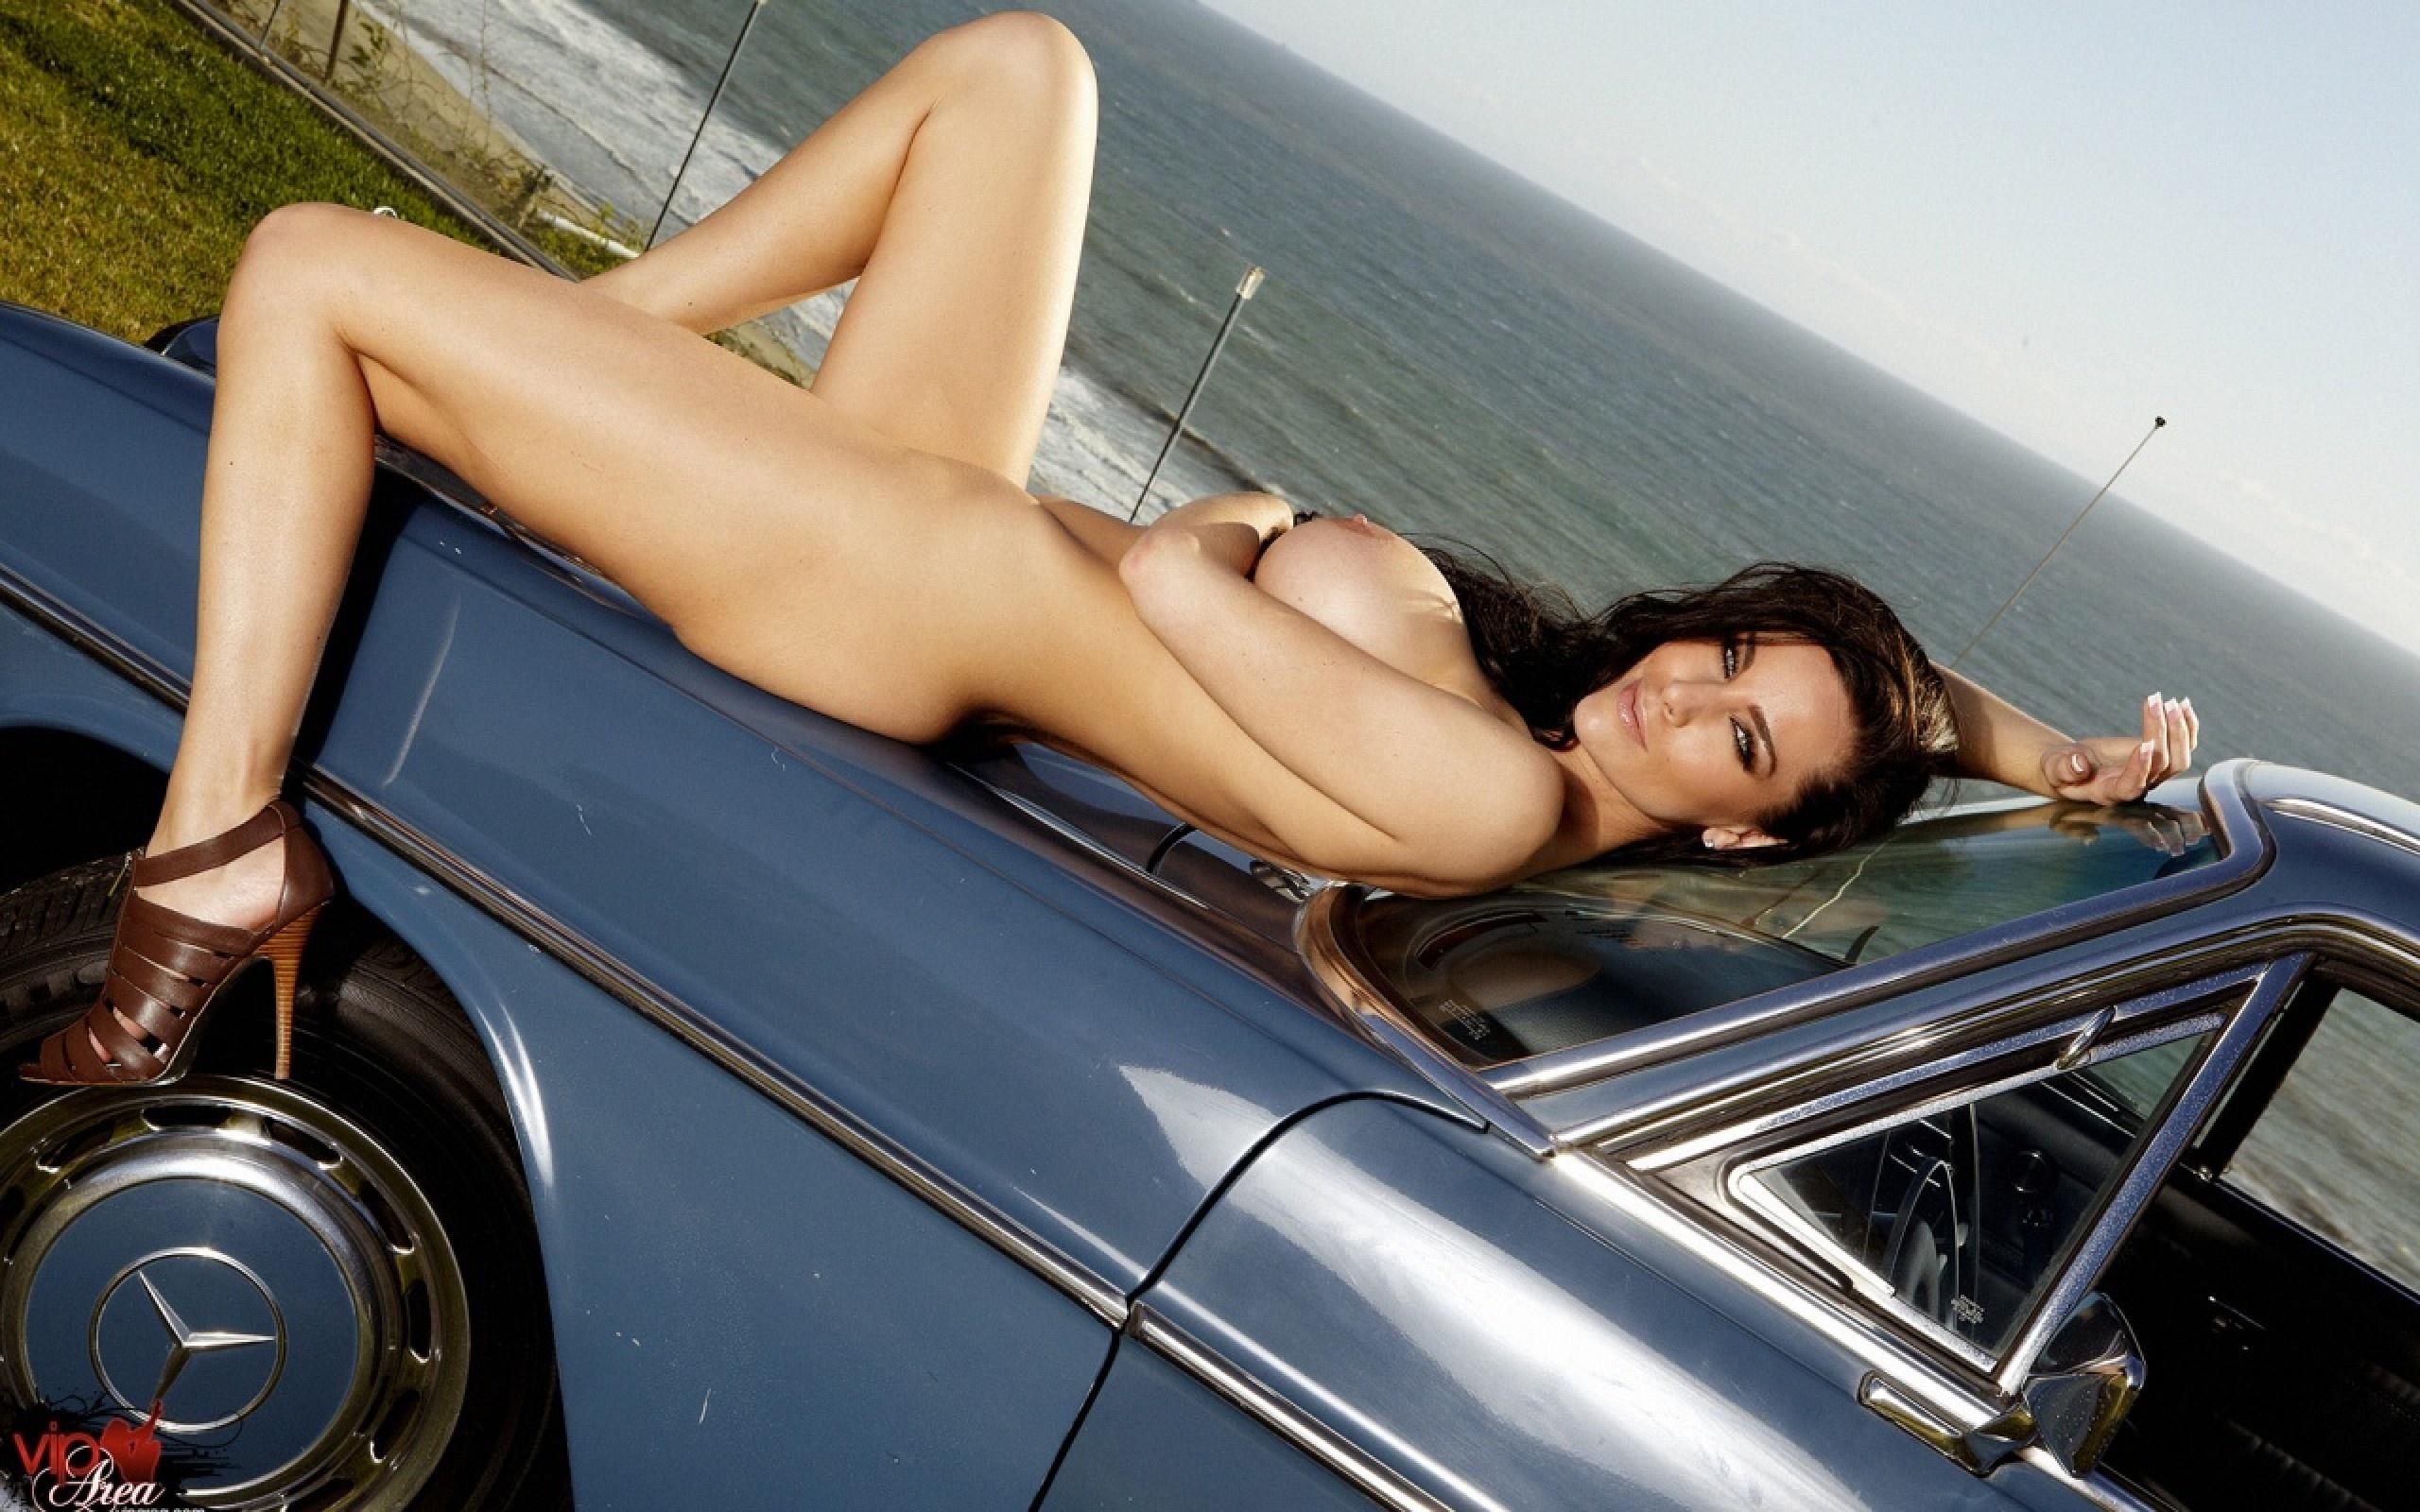 Nude pics in car-7595